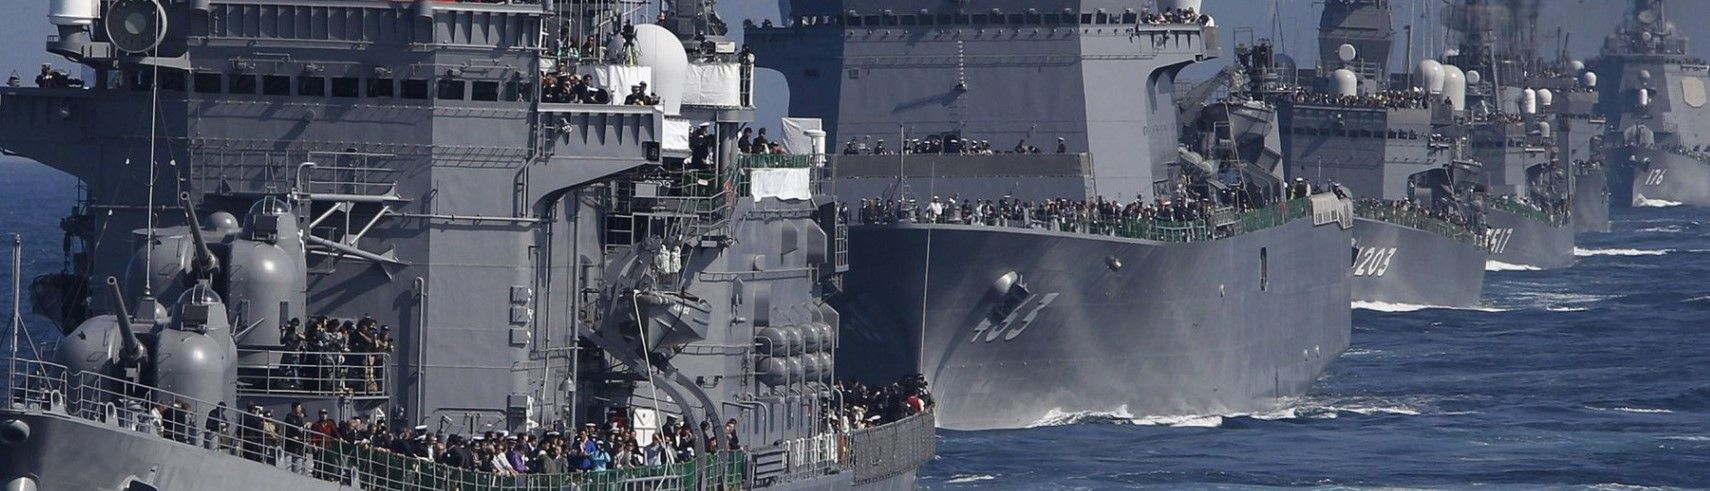 Japan Seeks Record $50 Billion Defense Budget With Eye on China | Bloomberg